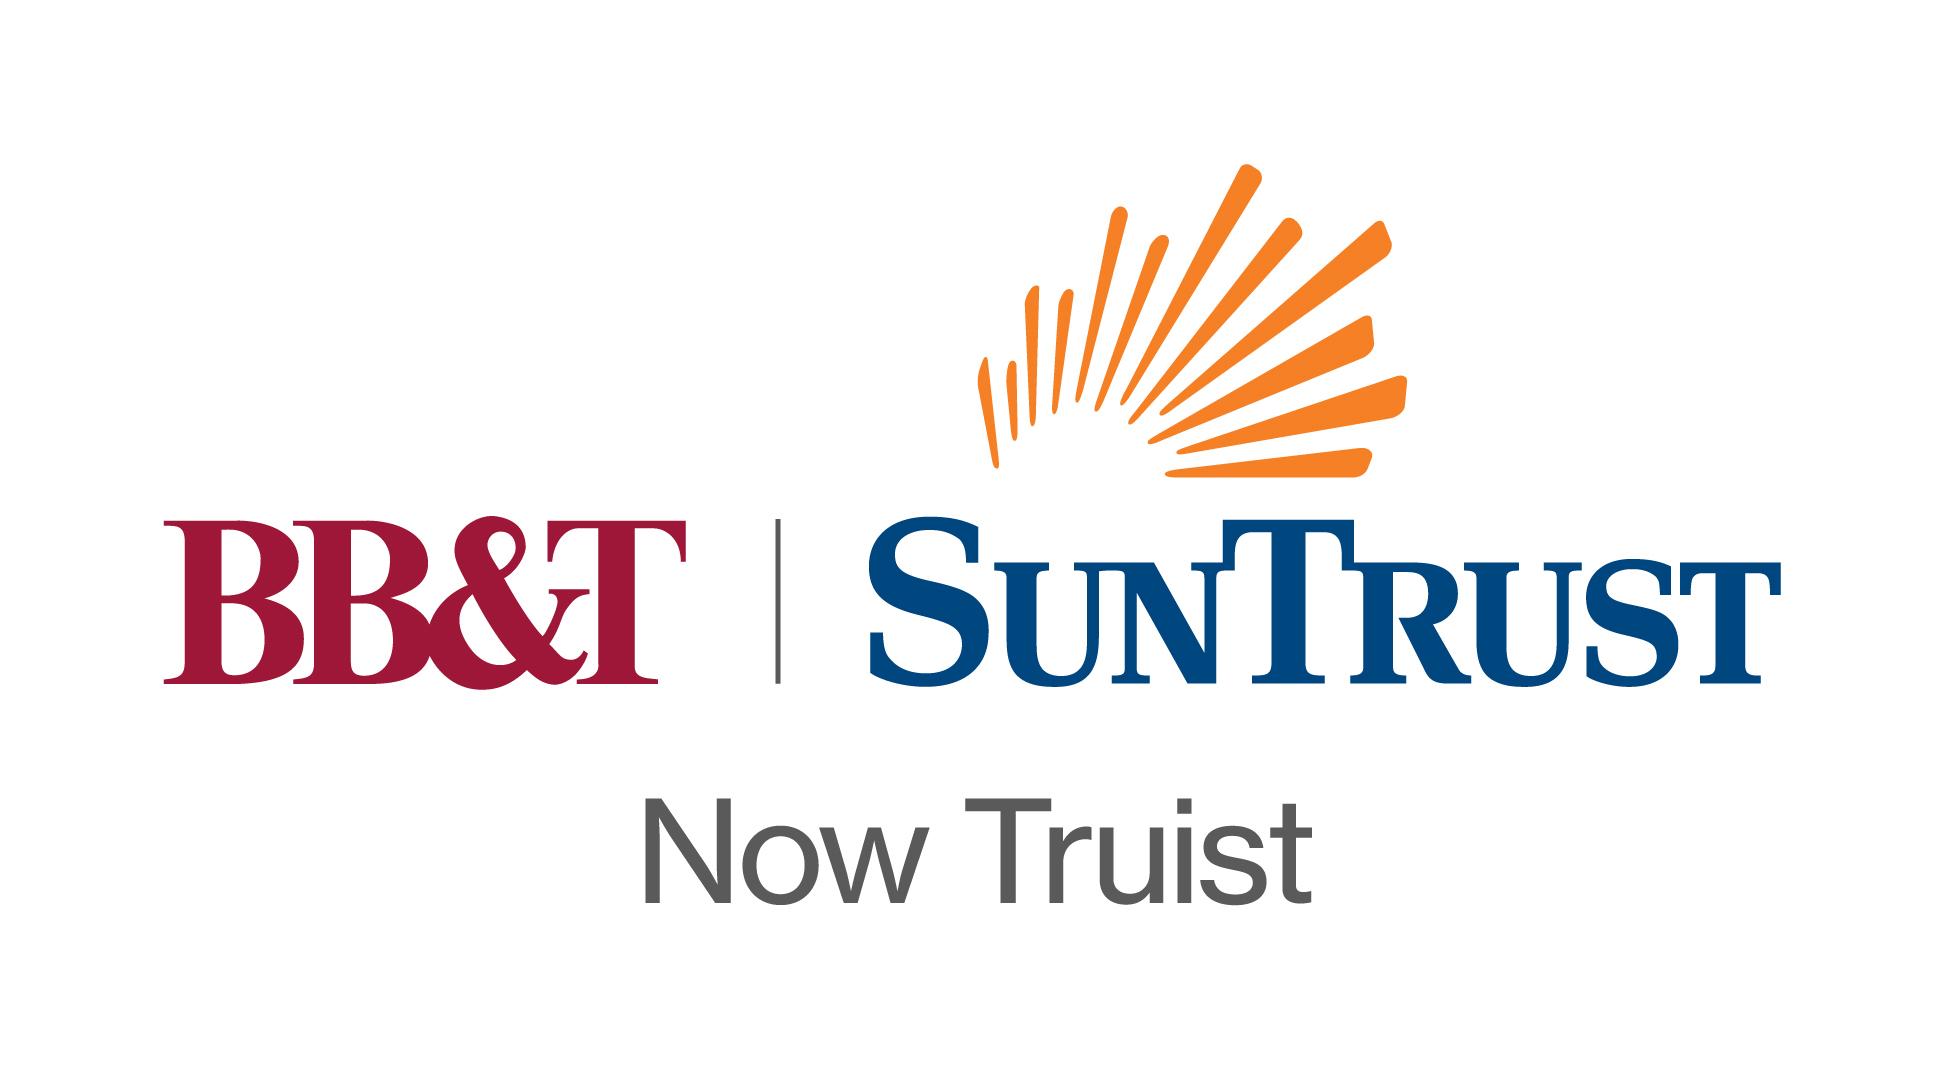 Logo BBT Sun Trust and Truist